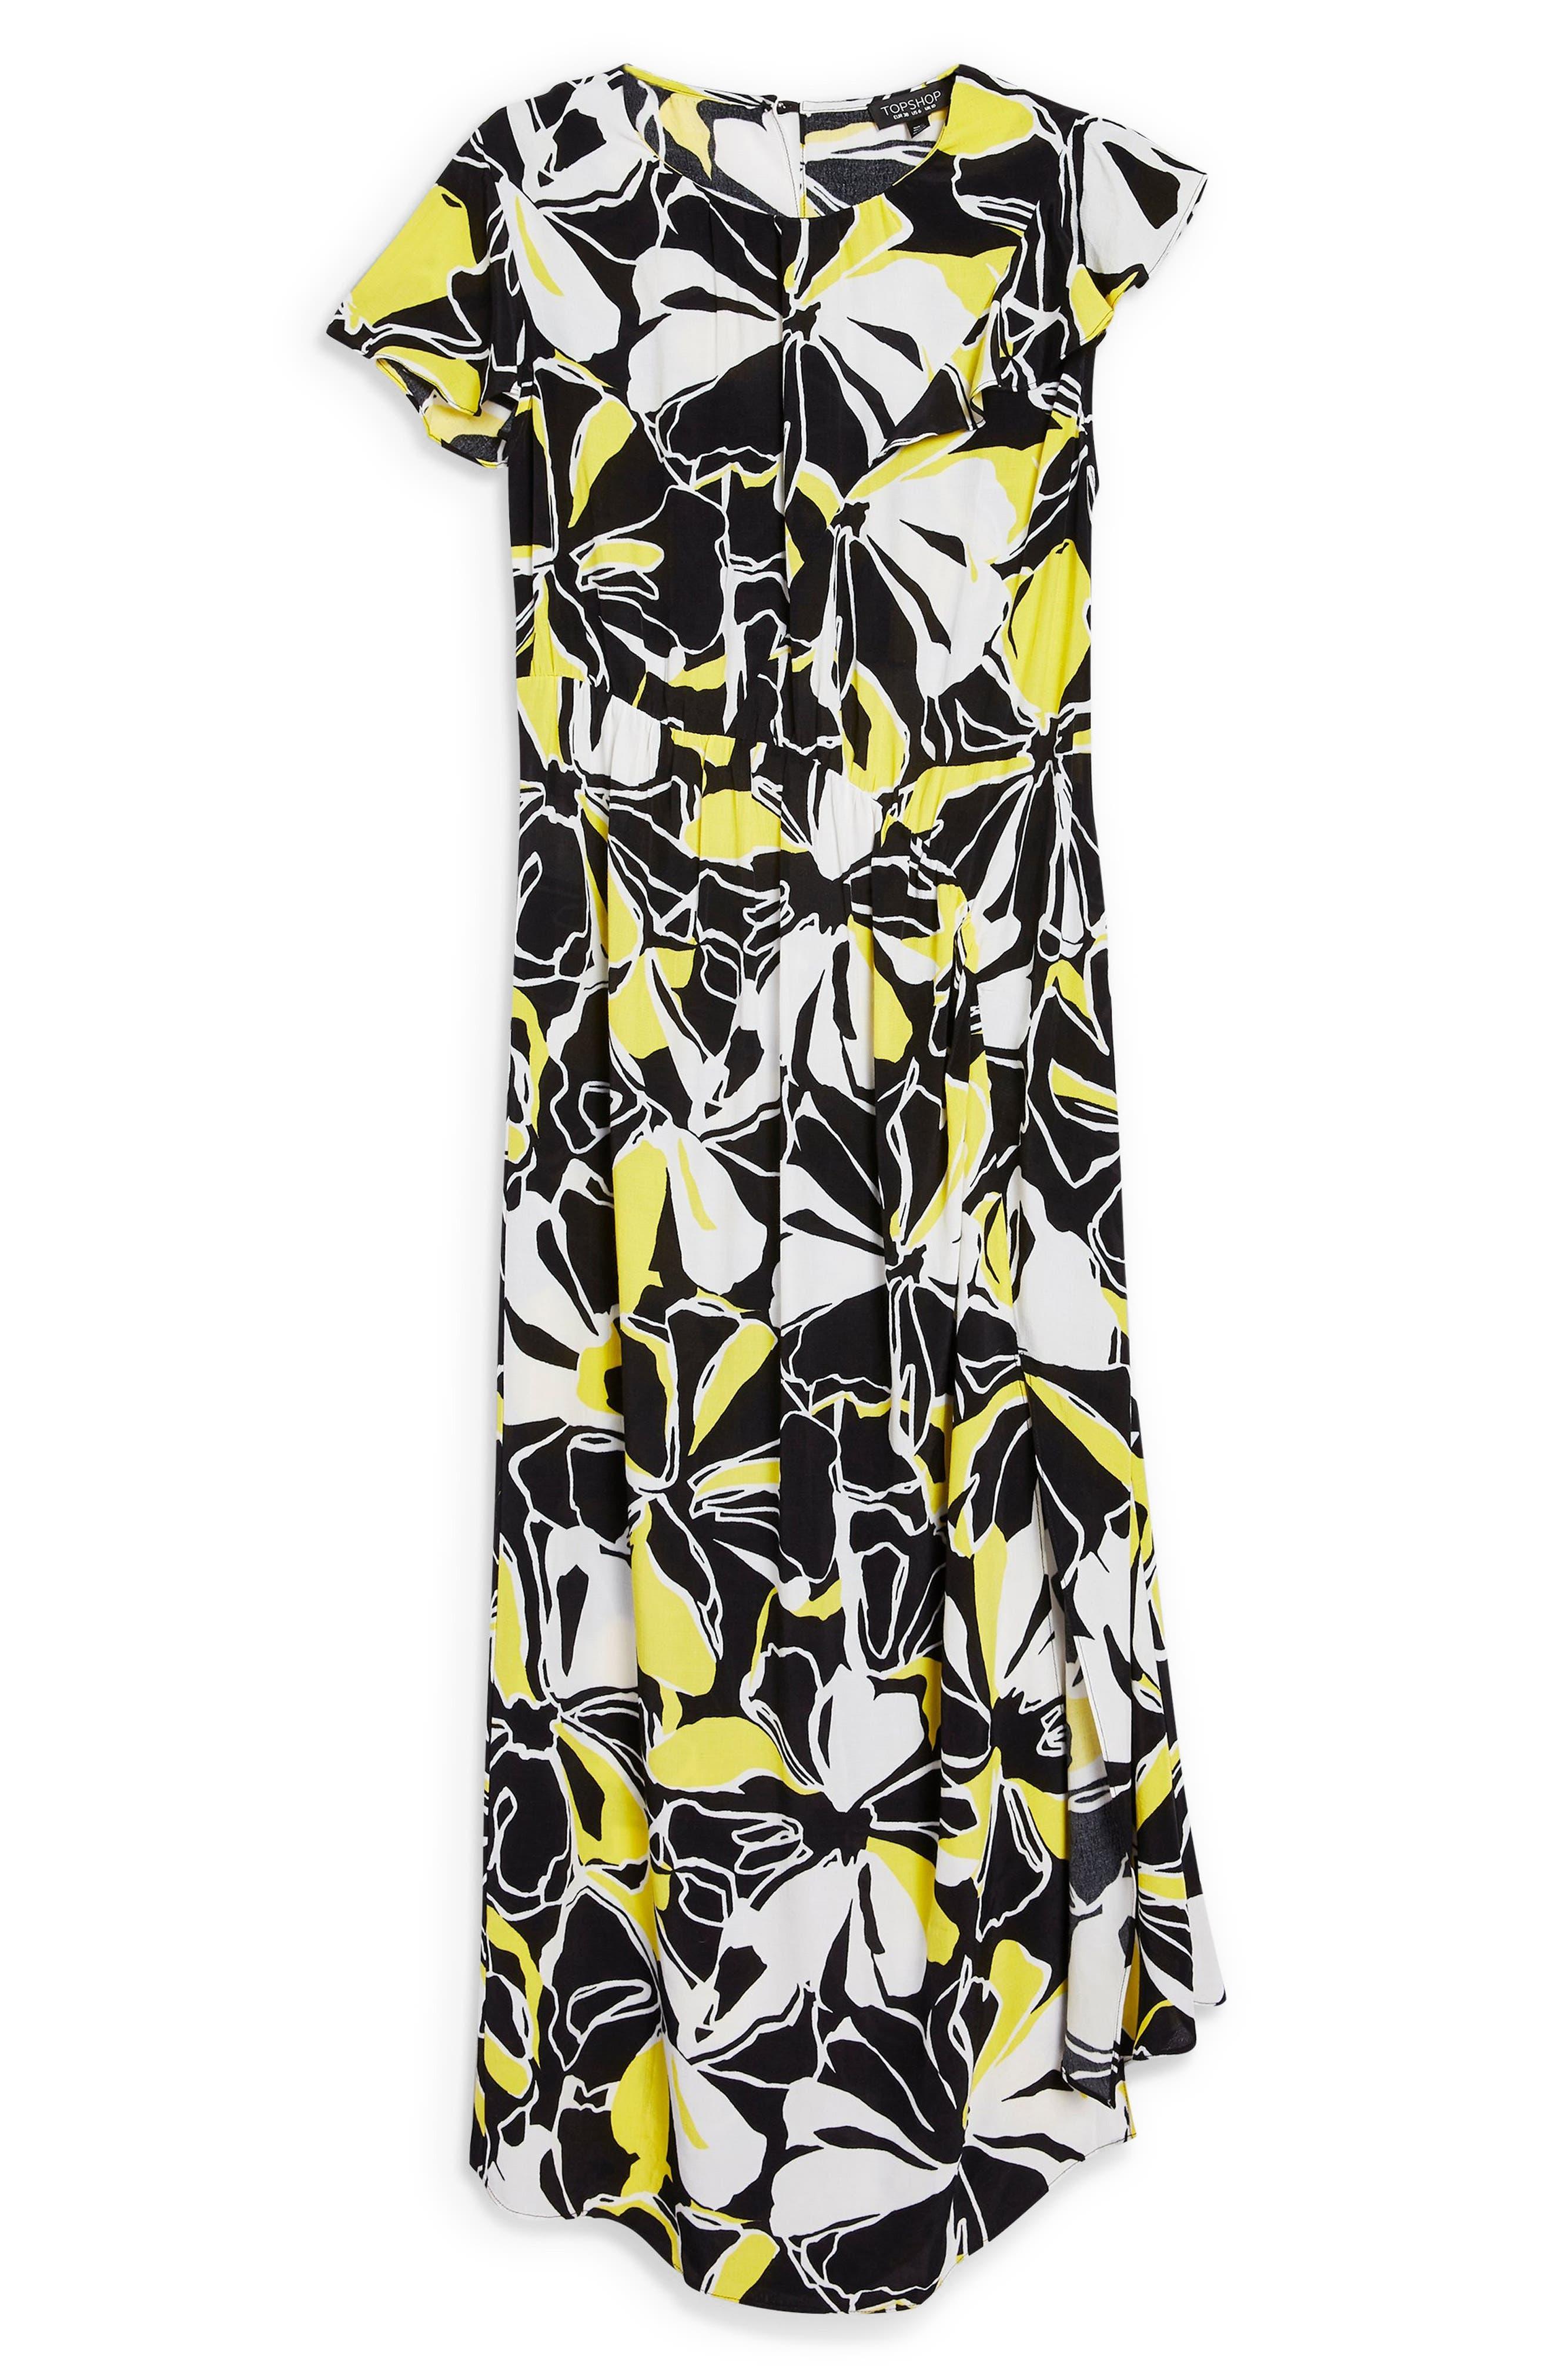 Deconstructed Floral Print Maxi Dress,                             Alternate thumbnail 6, color,                             BLACK MULTI